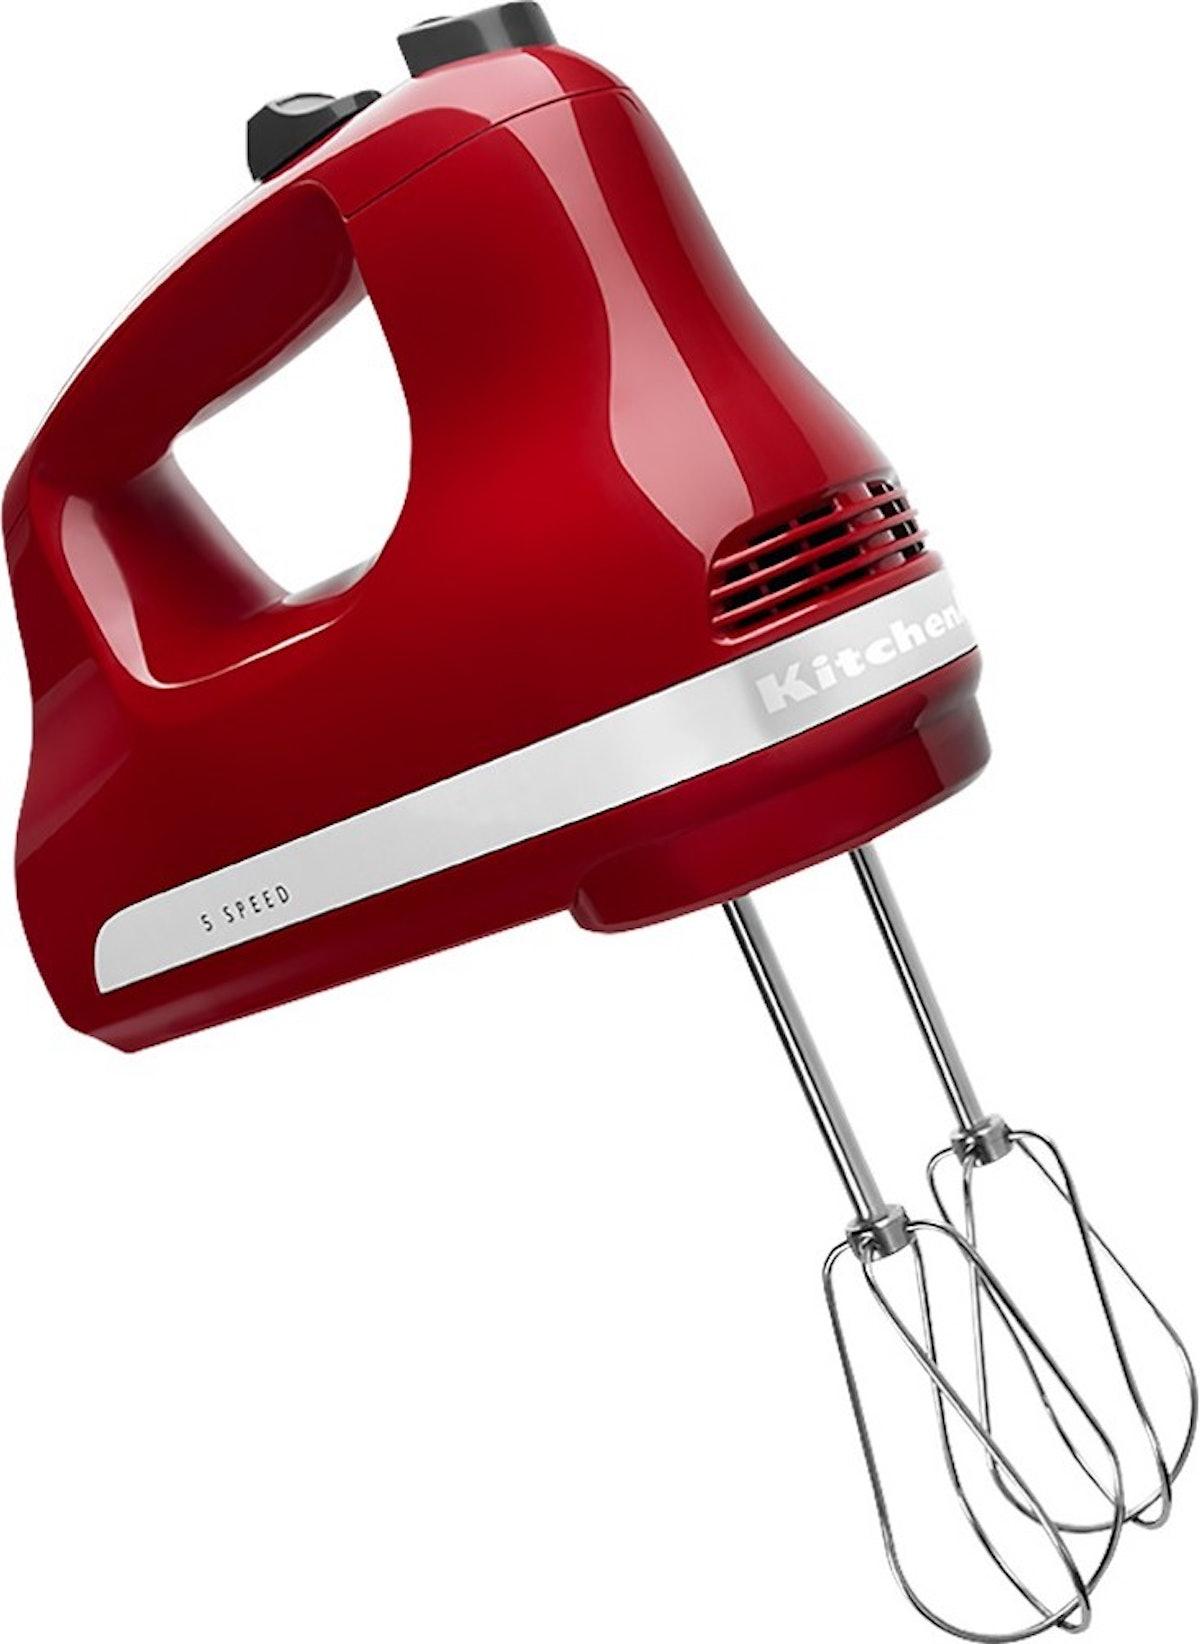 KitchenAid 5-Speed Hand Mixer in Empire Red